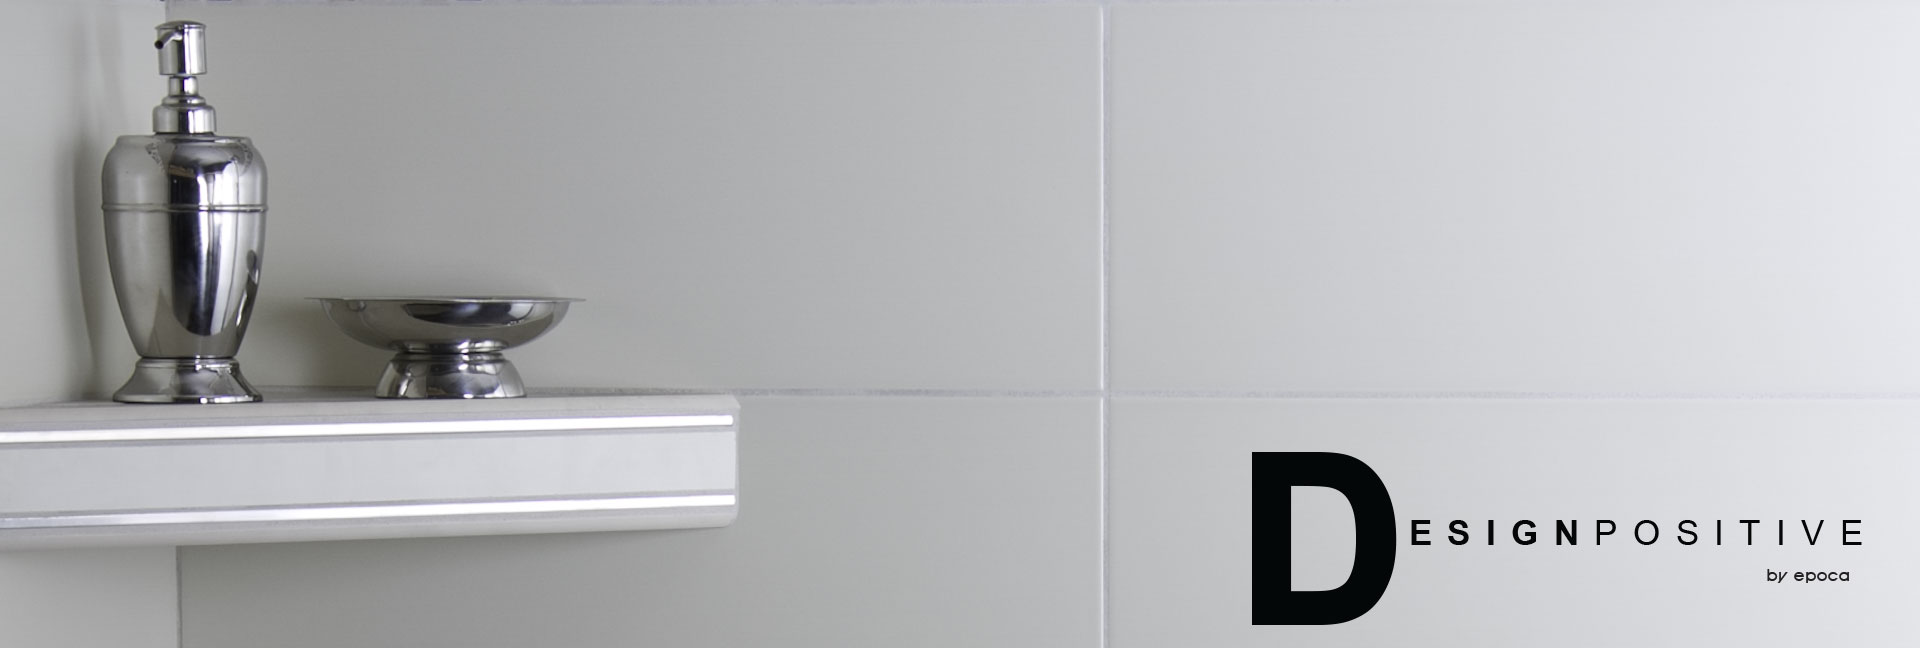 Design positive ceramic wall tile for Design positive tile